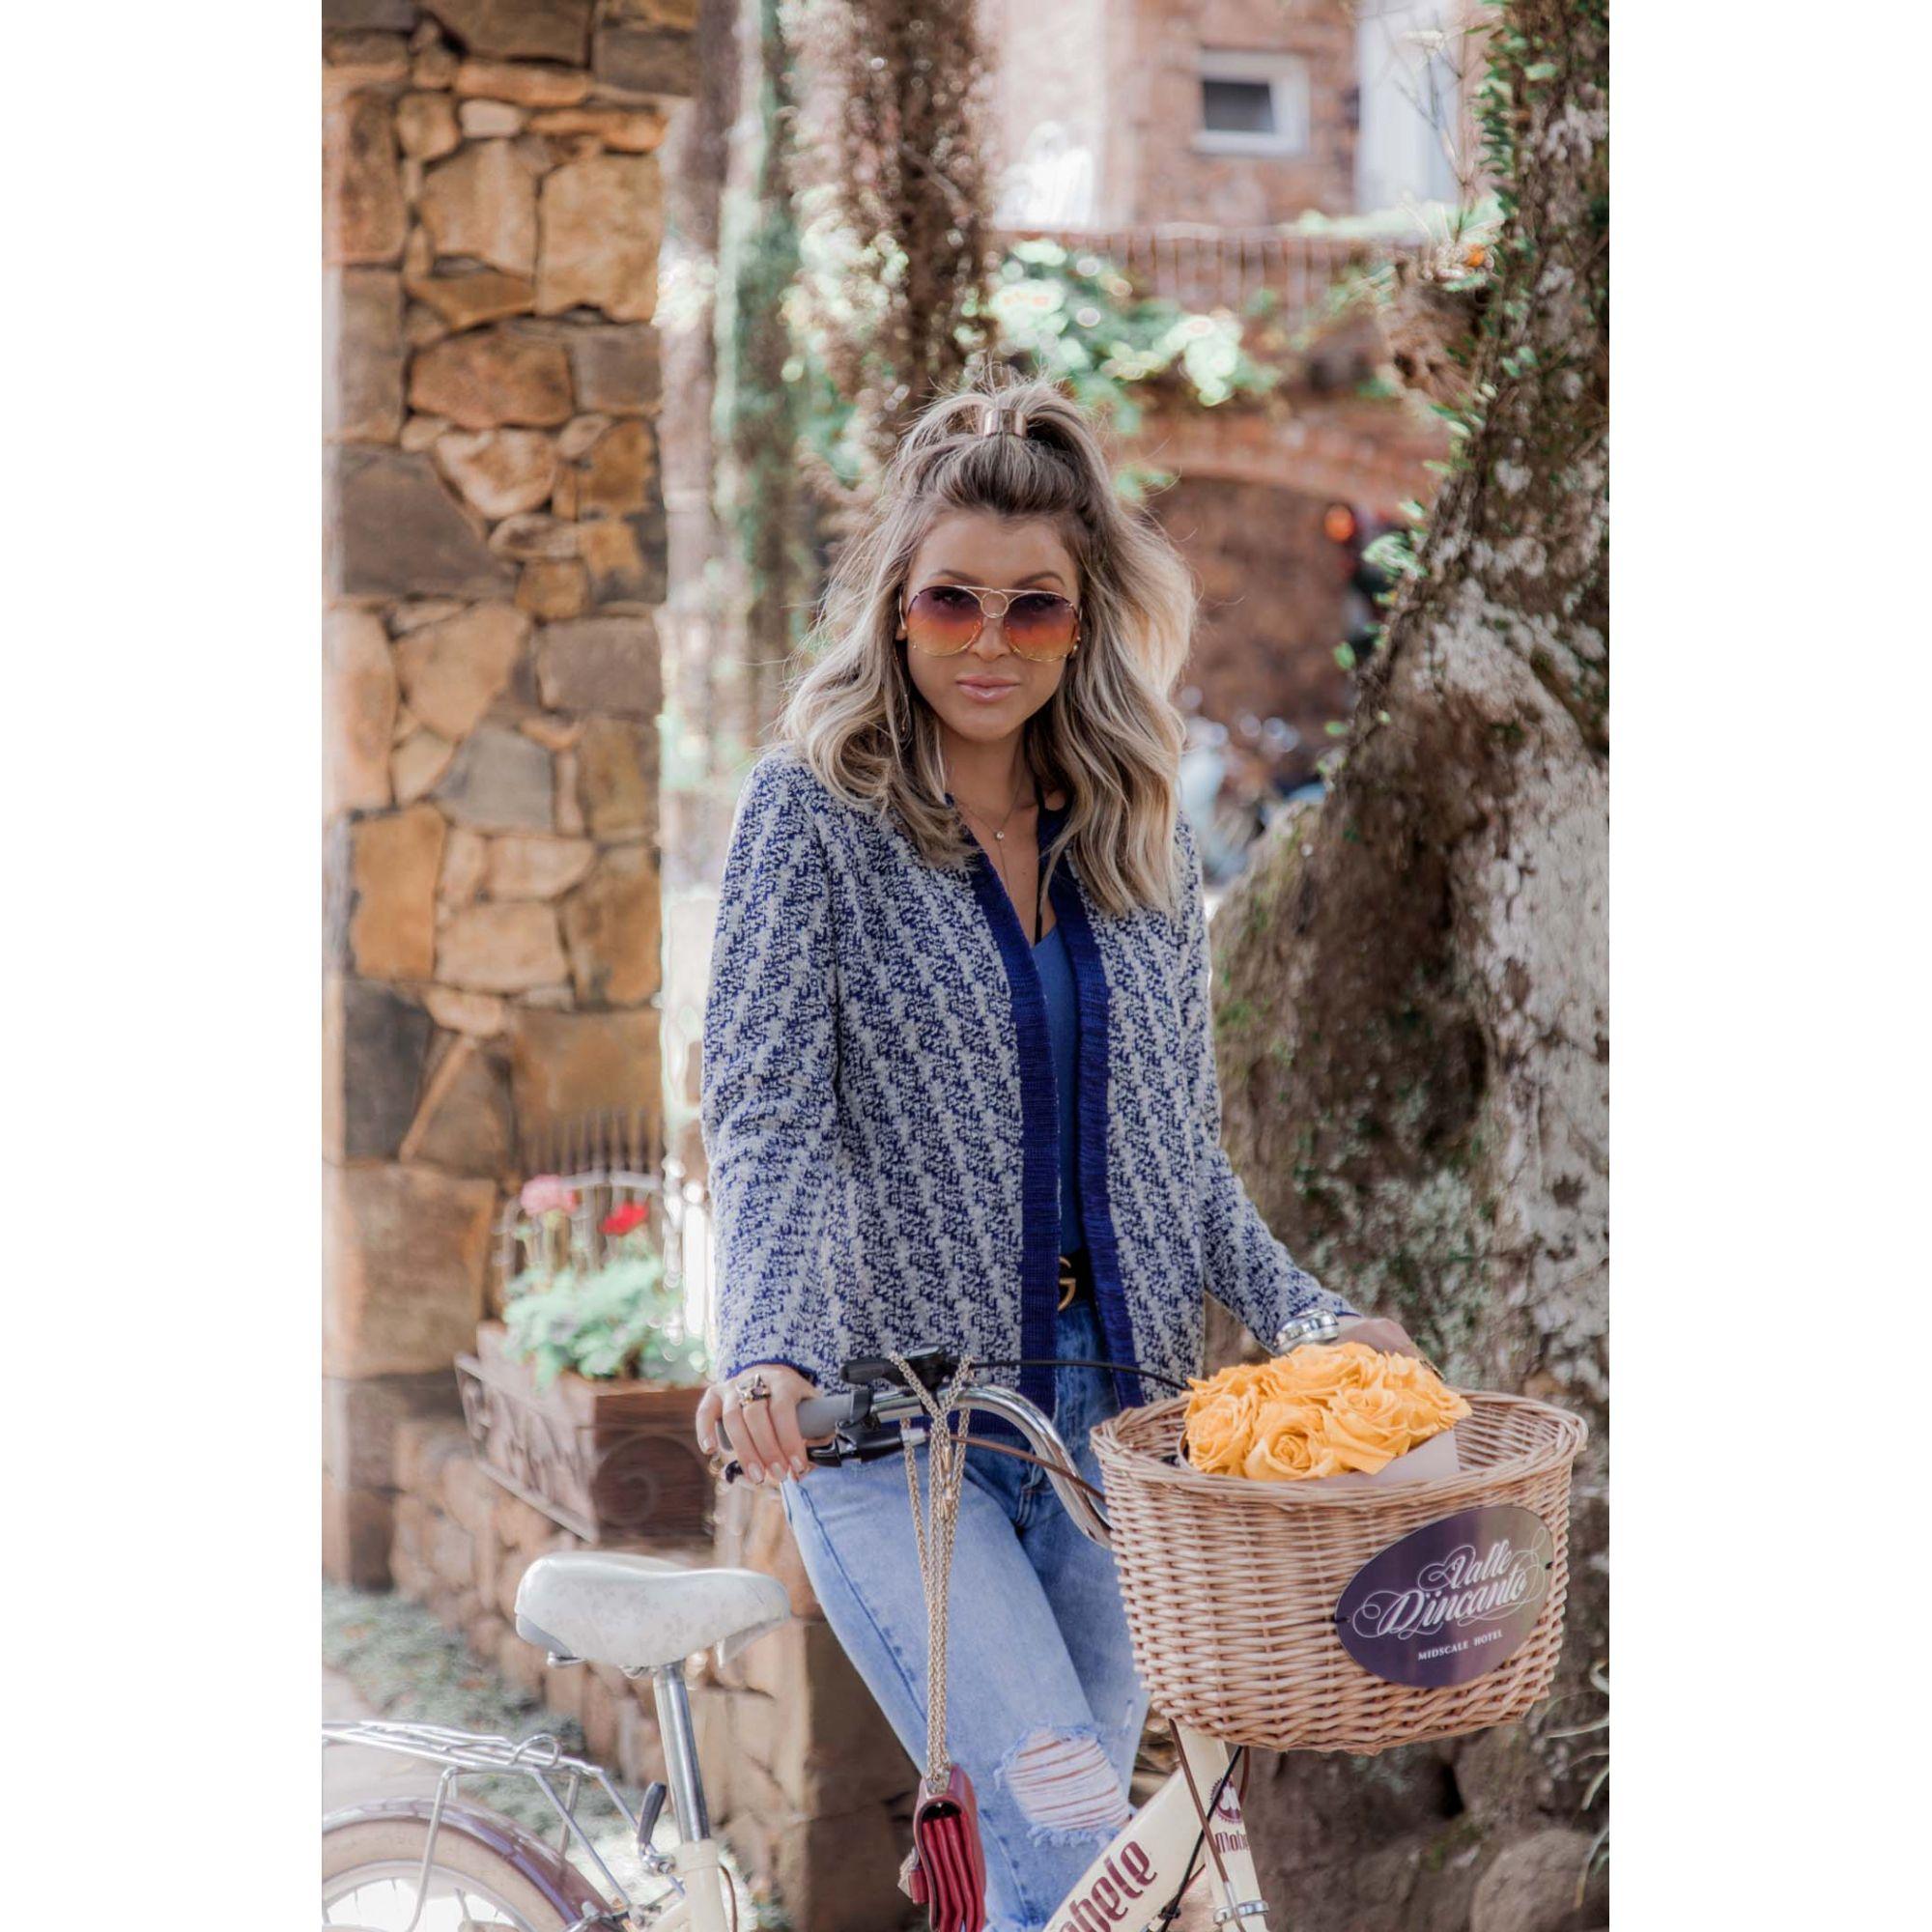 Casaco Jacquard Vera Tricot Feminino Cinza / Azul